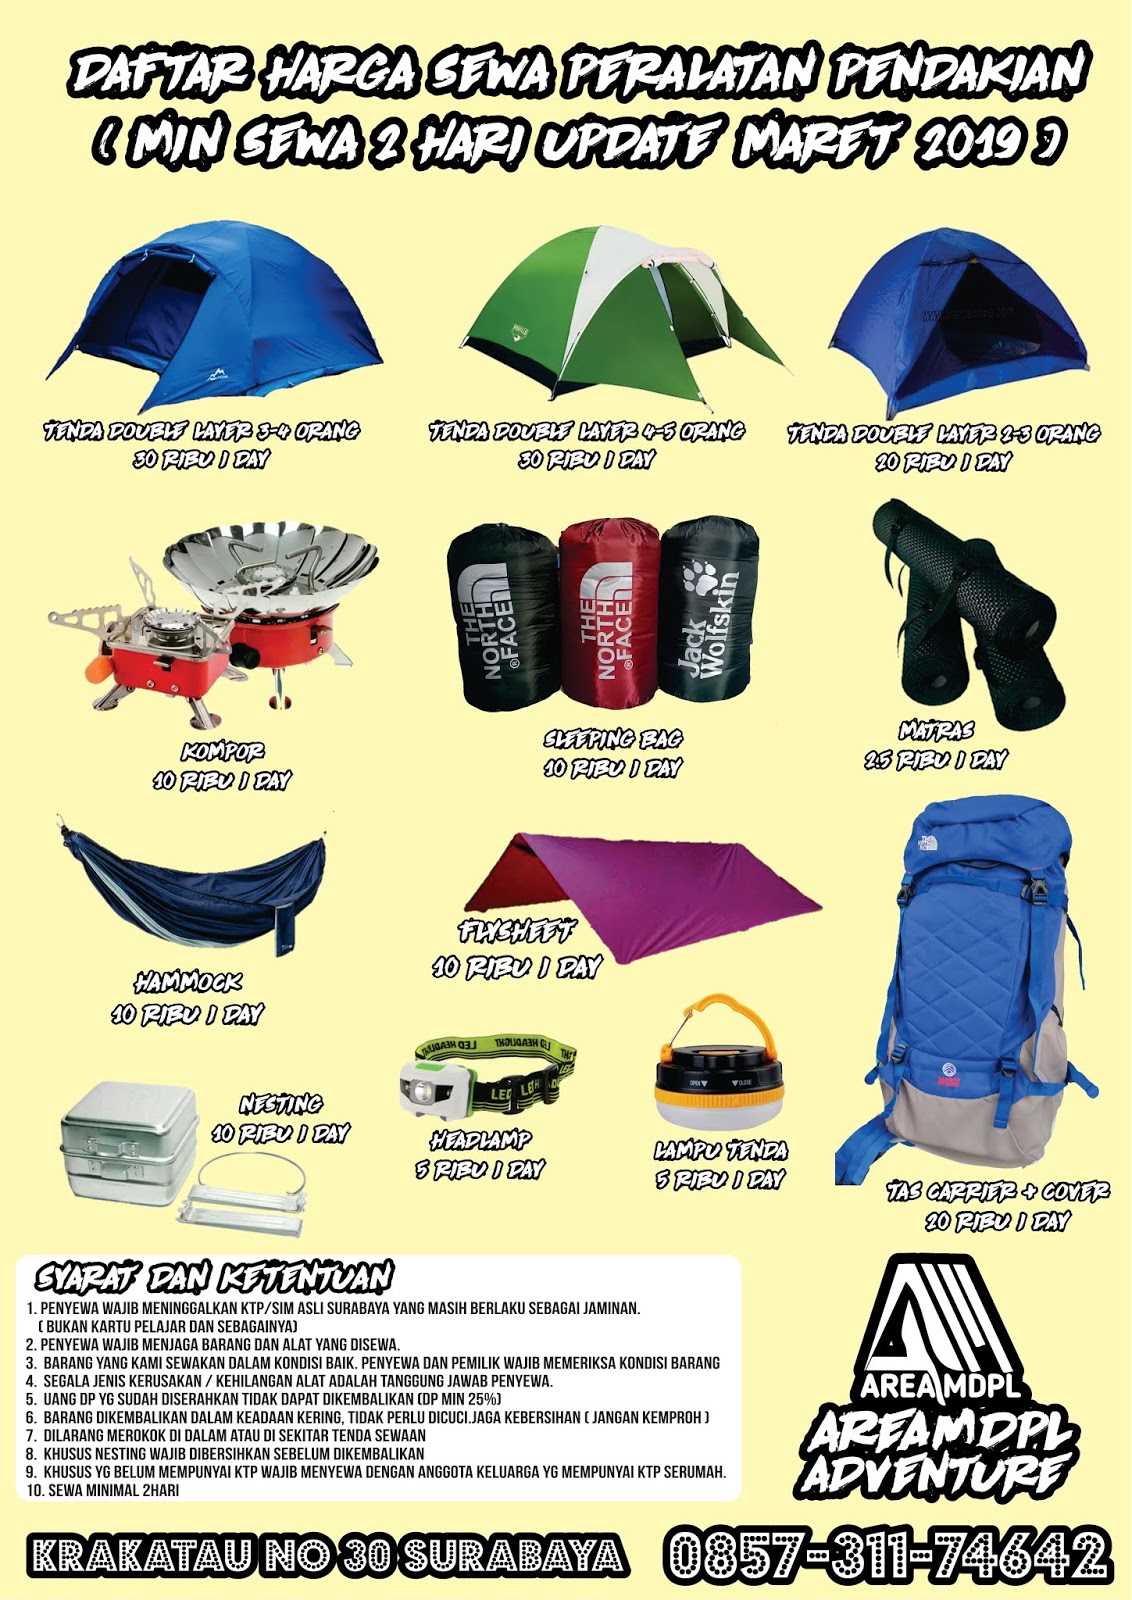 Areamdpl Adventure Store Rental Tenda Alat Camping Surabaya